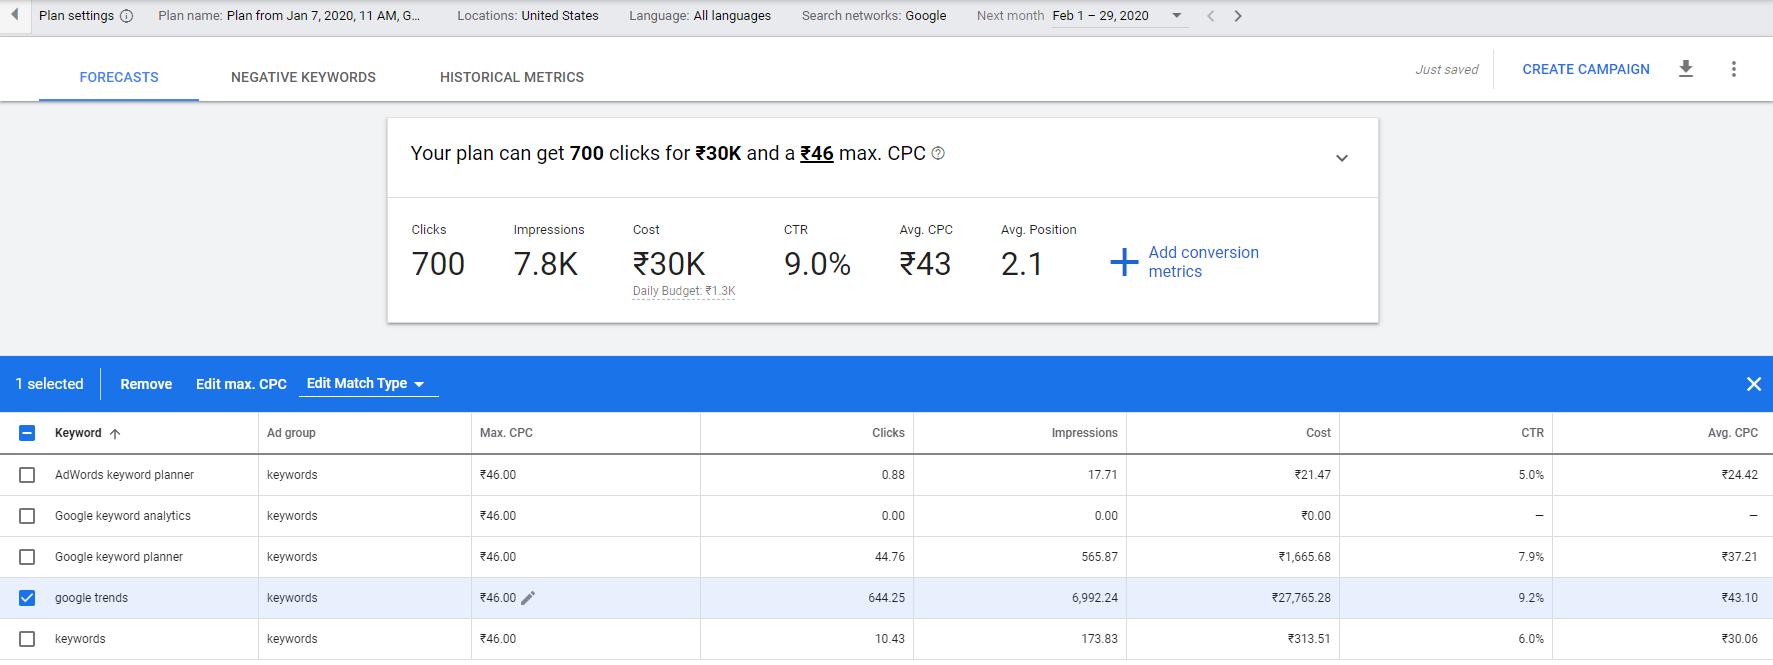 Google Keywords Planner Forecast